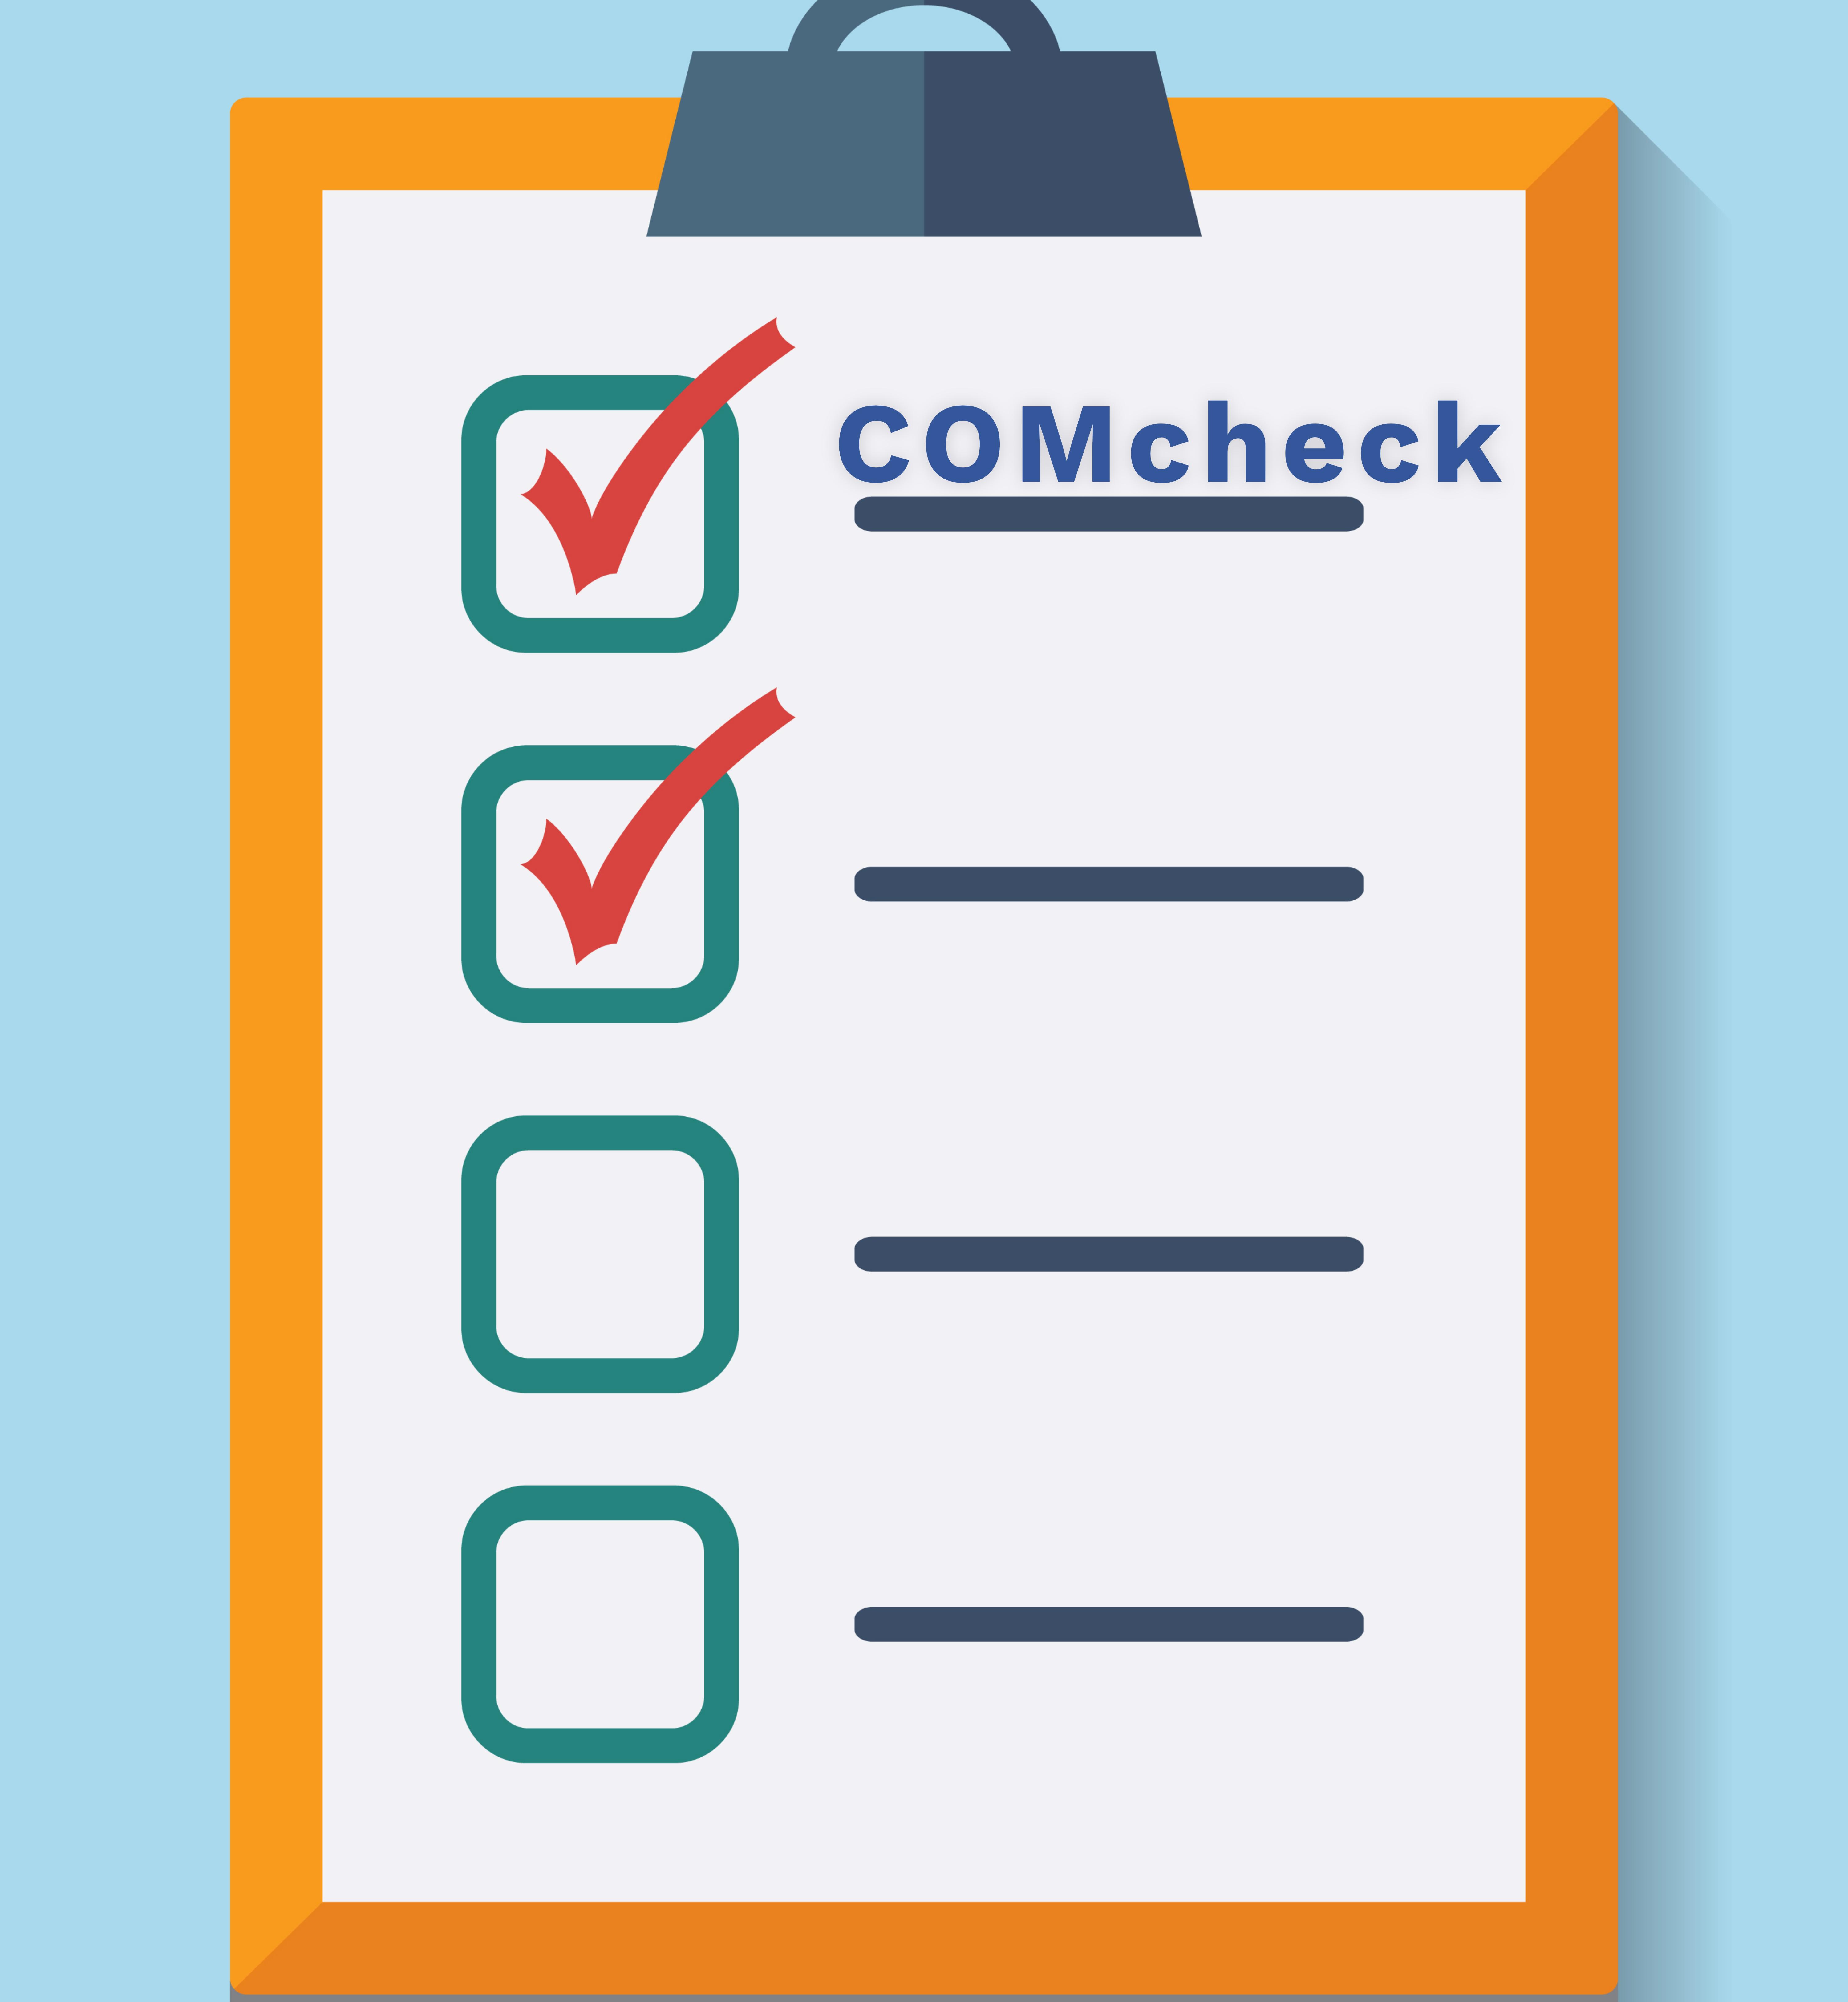 ComCheck